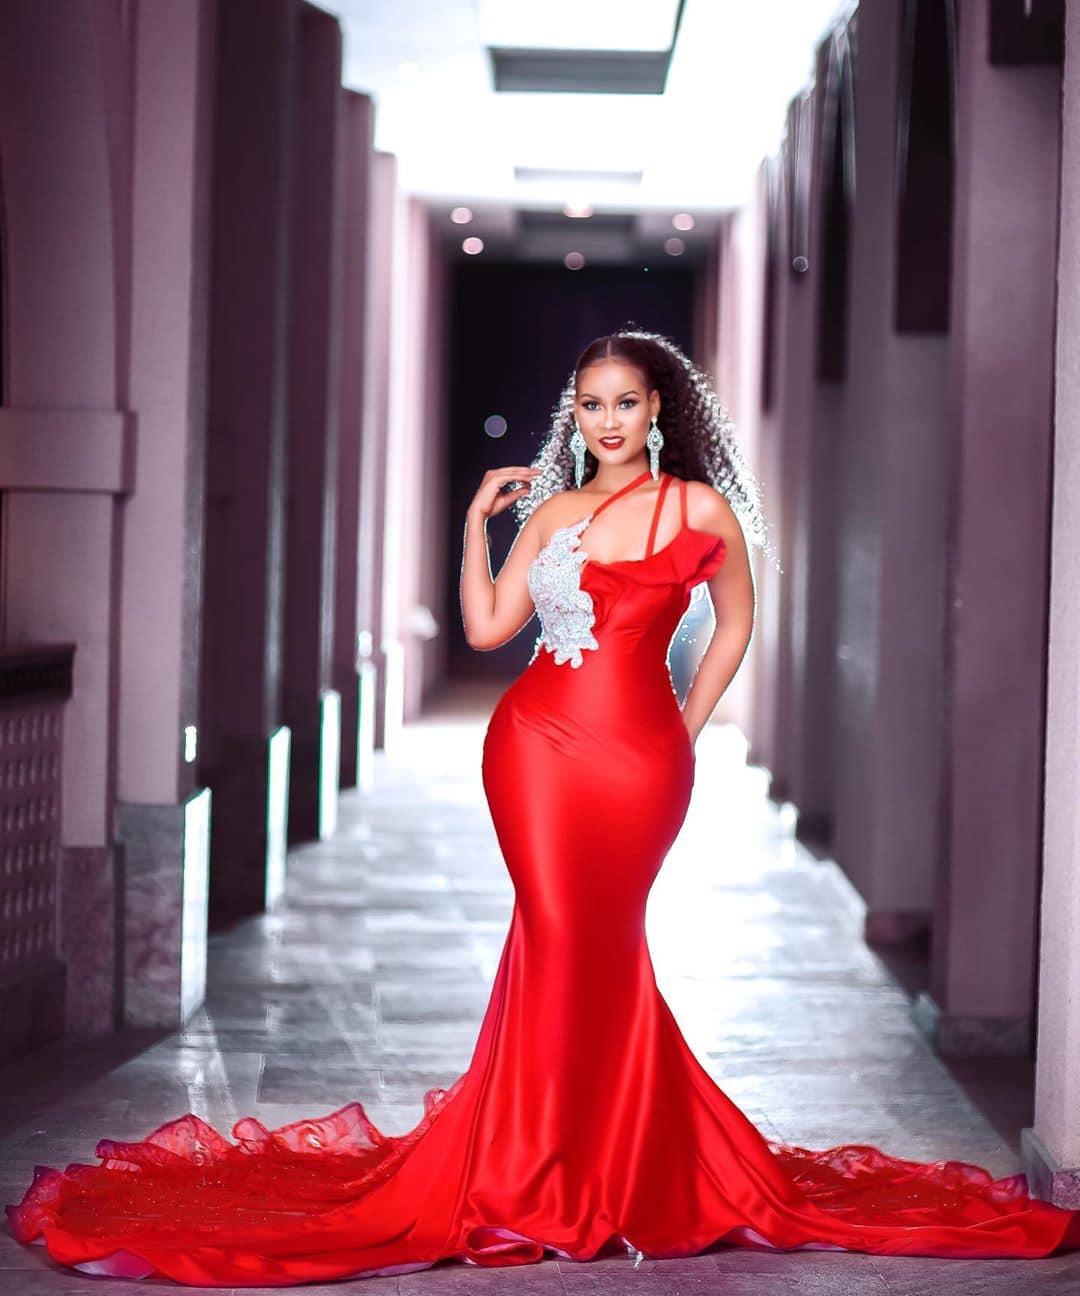 tanzanian-socialite-best-dressed-african-stars-2019-hamisa-mobetto